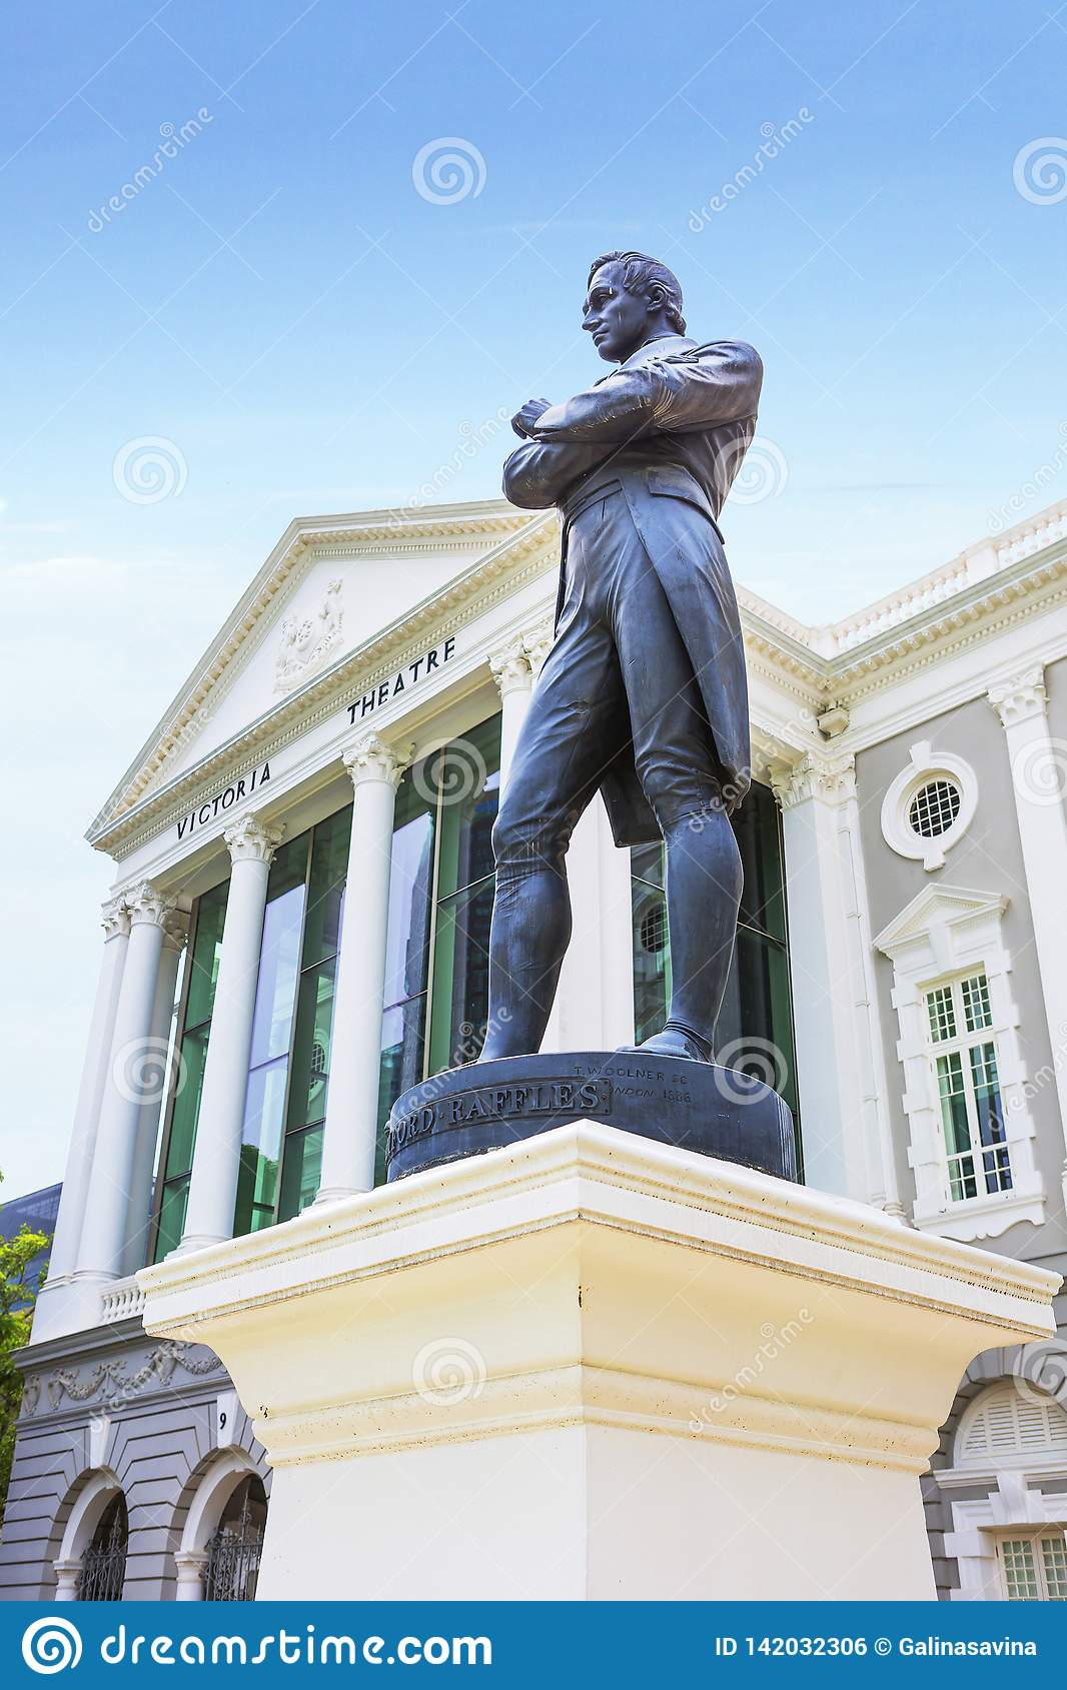 Singapur, sir Stamford Raffles statuę